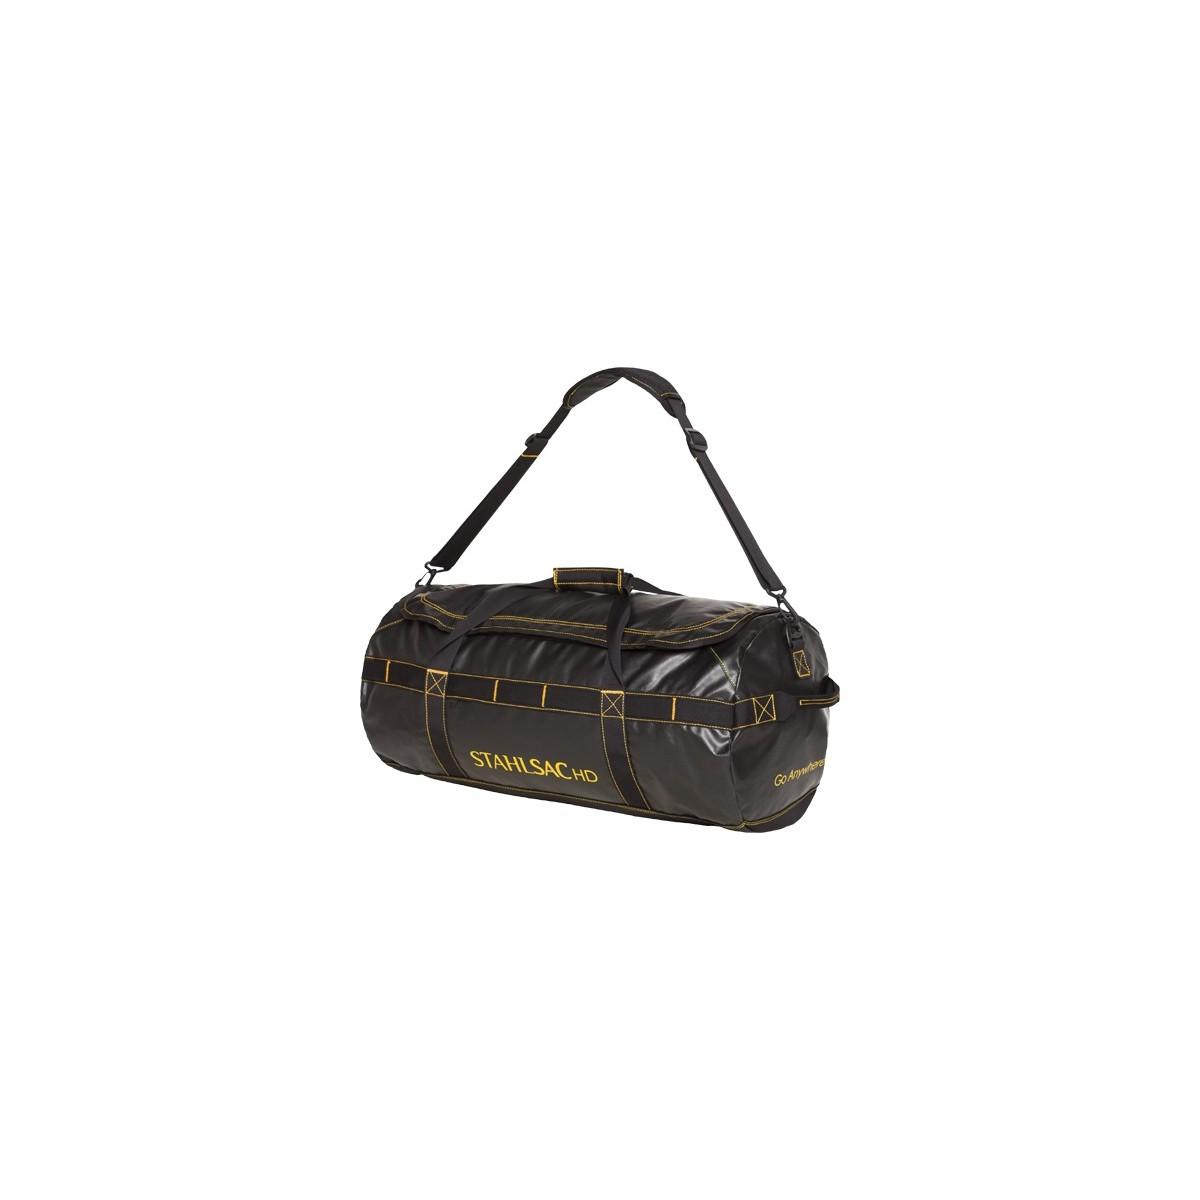 Stahlsac HD Duffel Bag